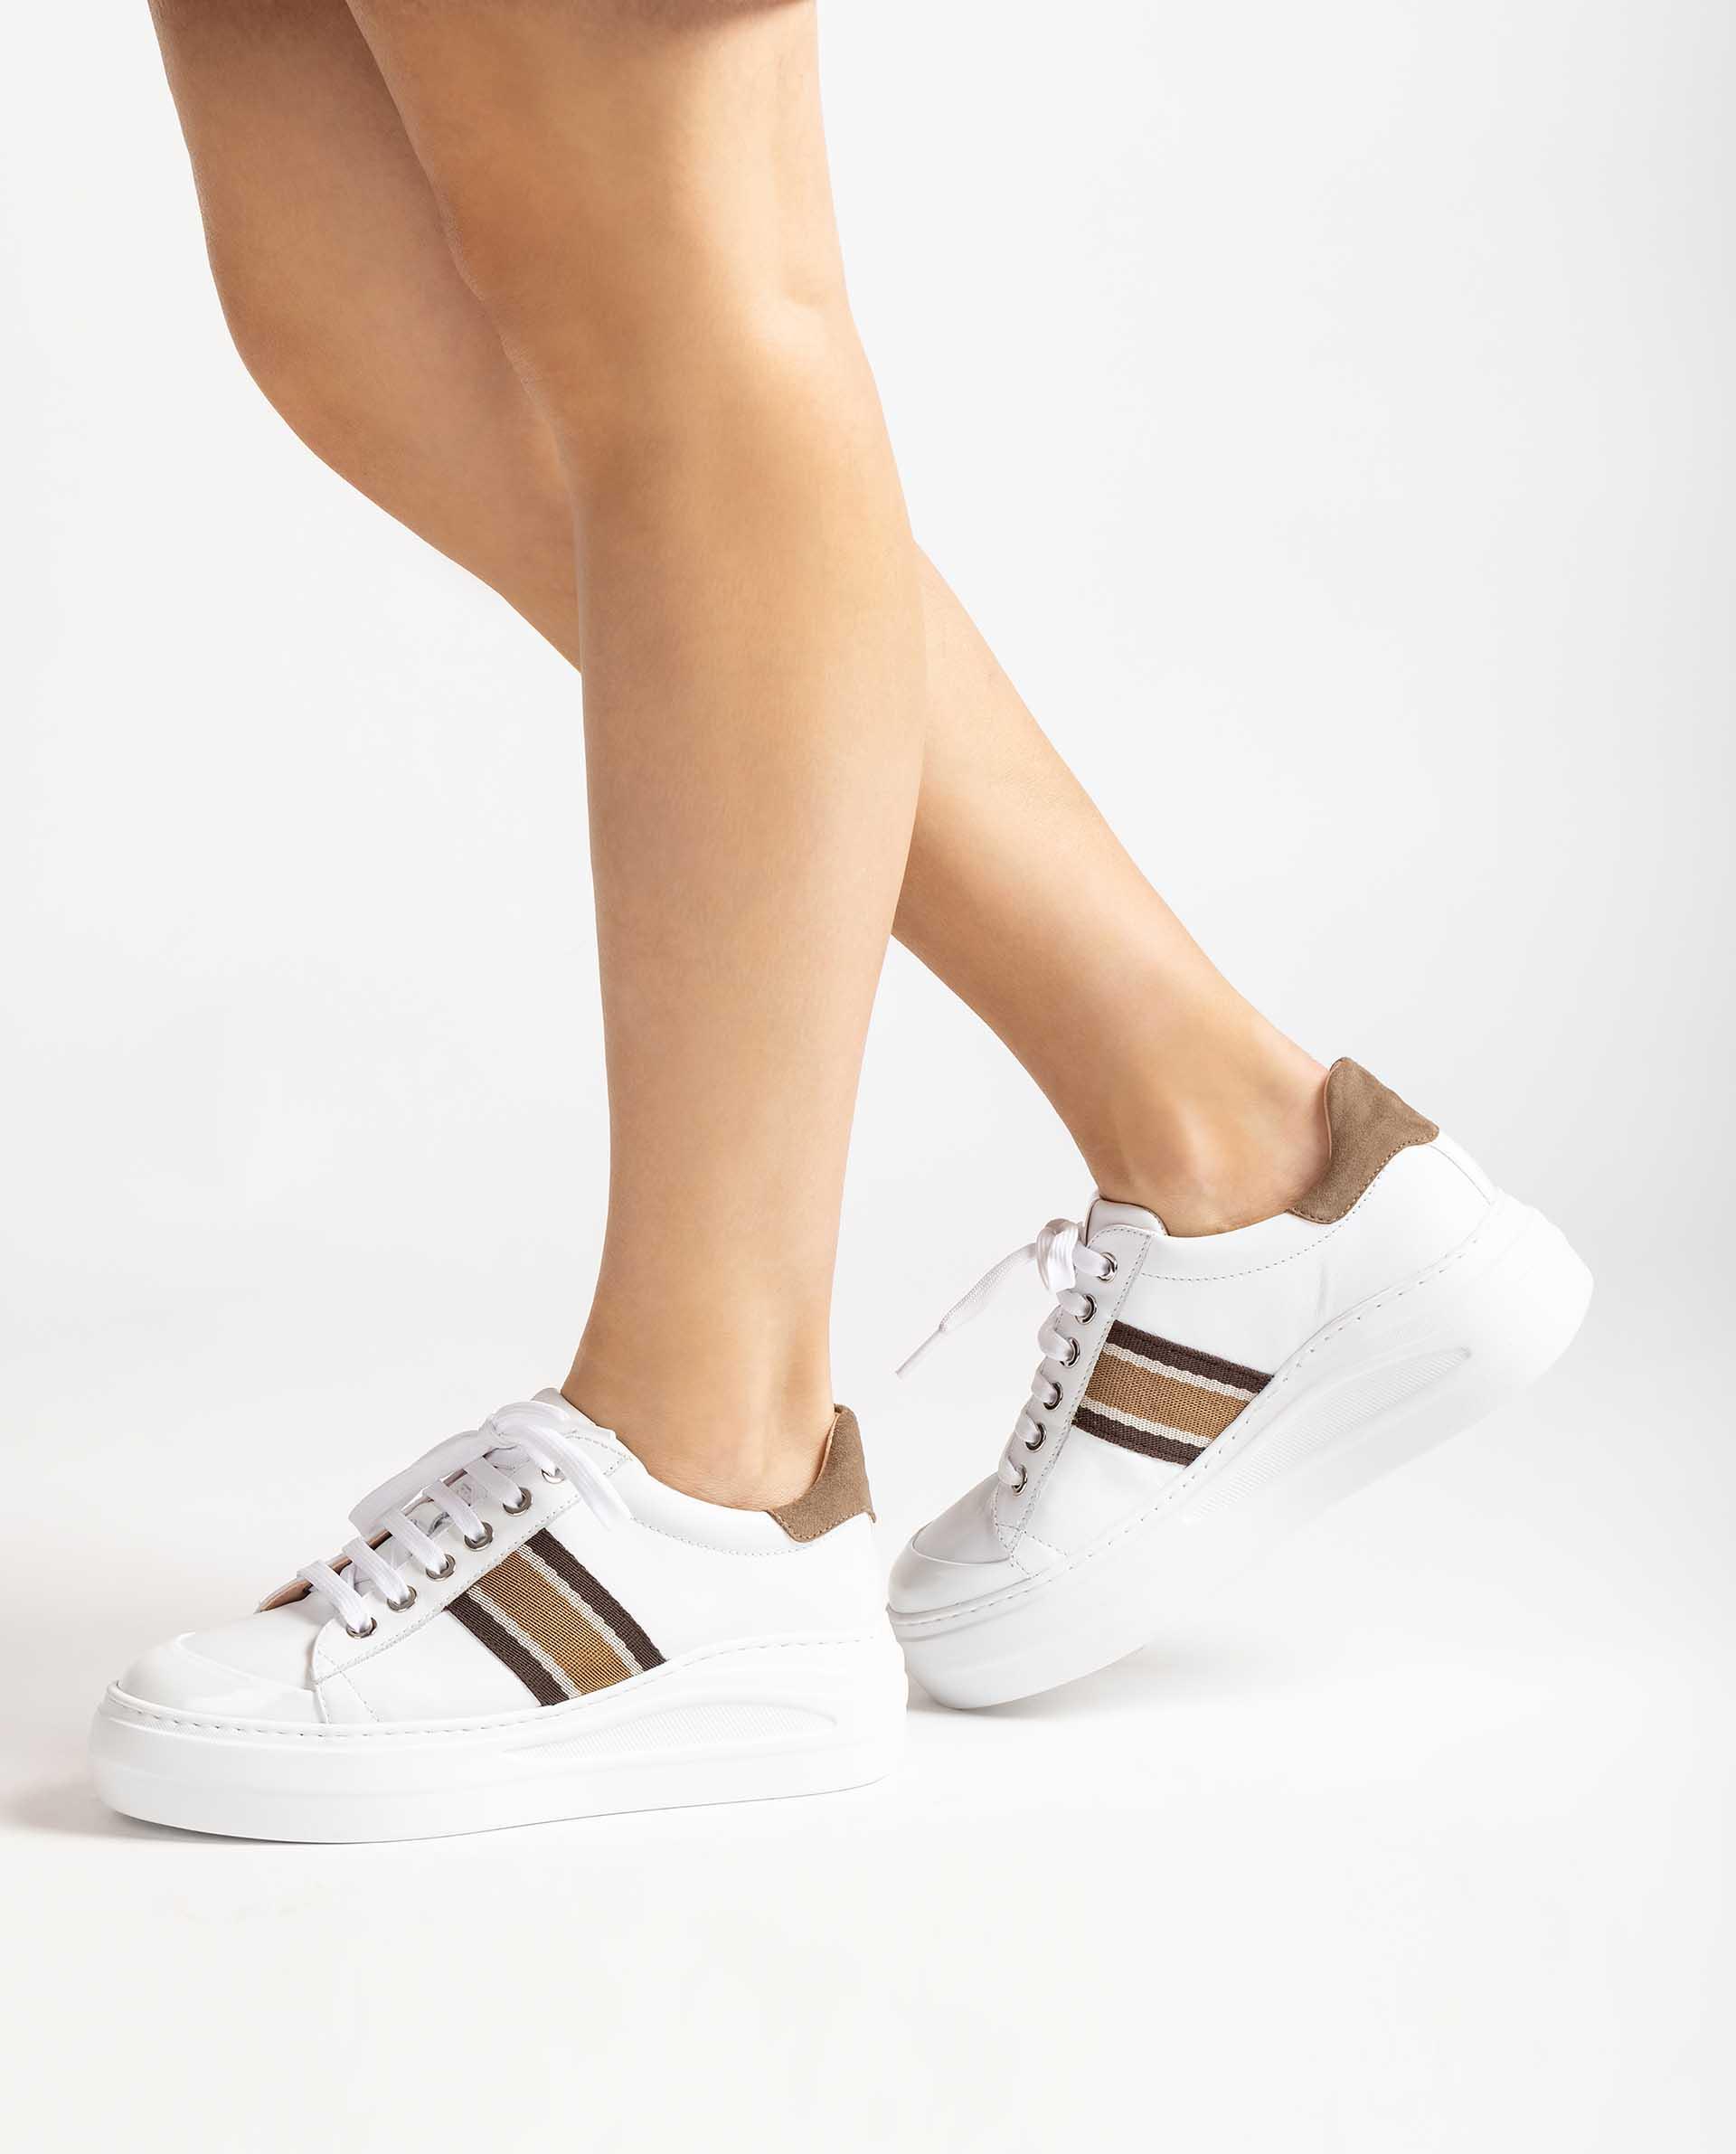 UNISA Leder-Sneaker mit buntem Streifen FRALI_NF 5